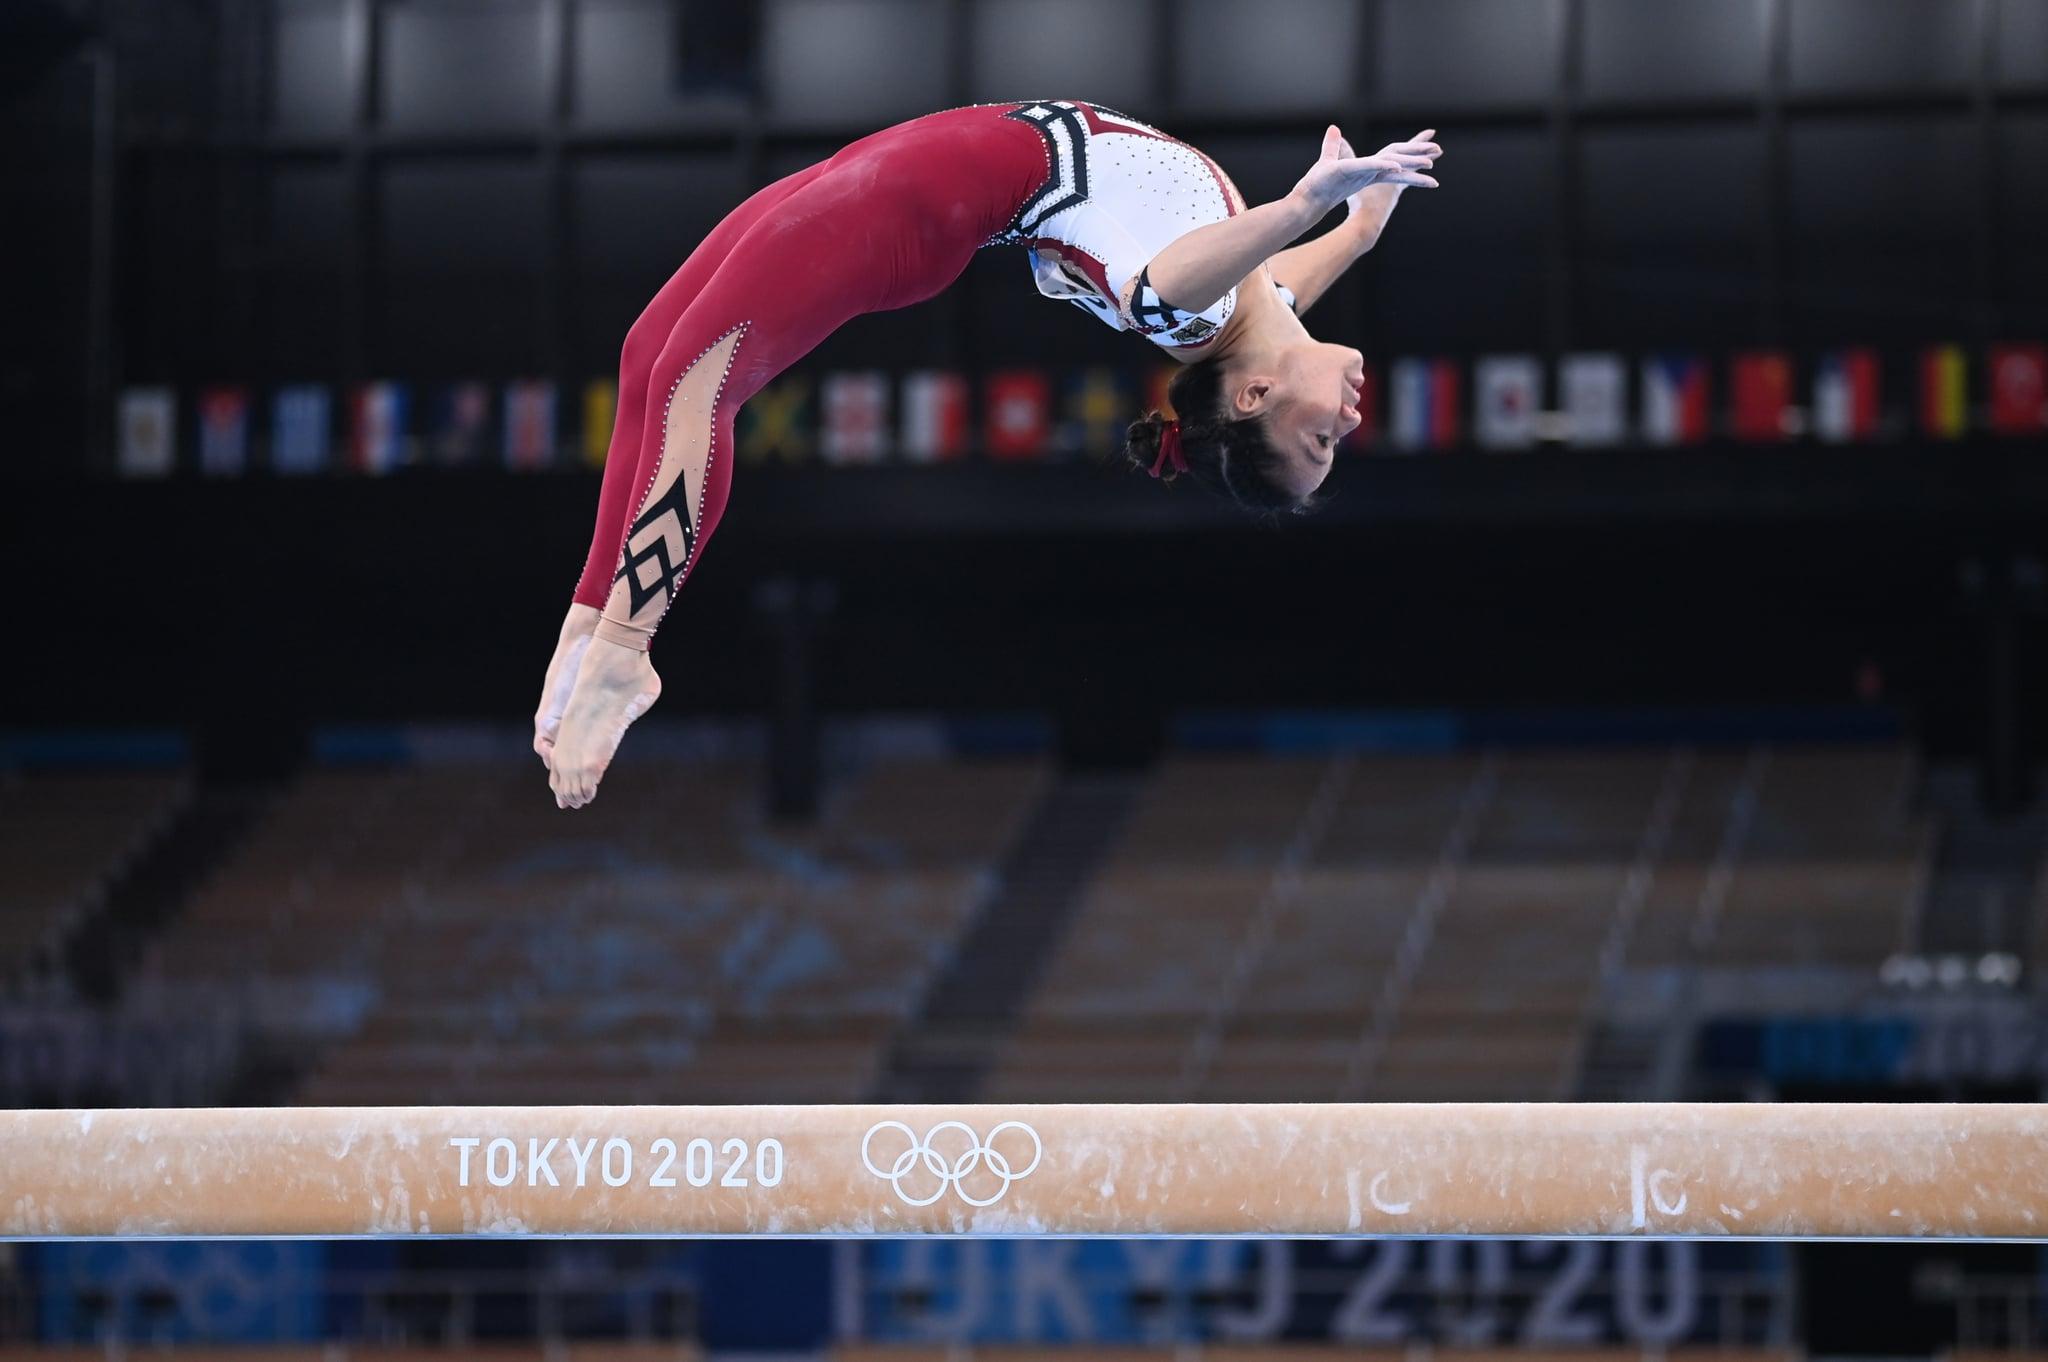 Germany Women's Gymnastics Team Wear Unitards at Olympics | POPSUGAR Fitness